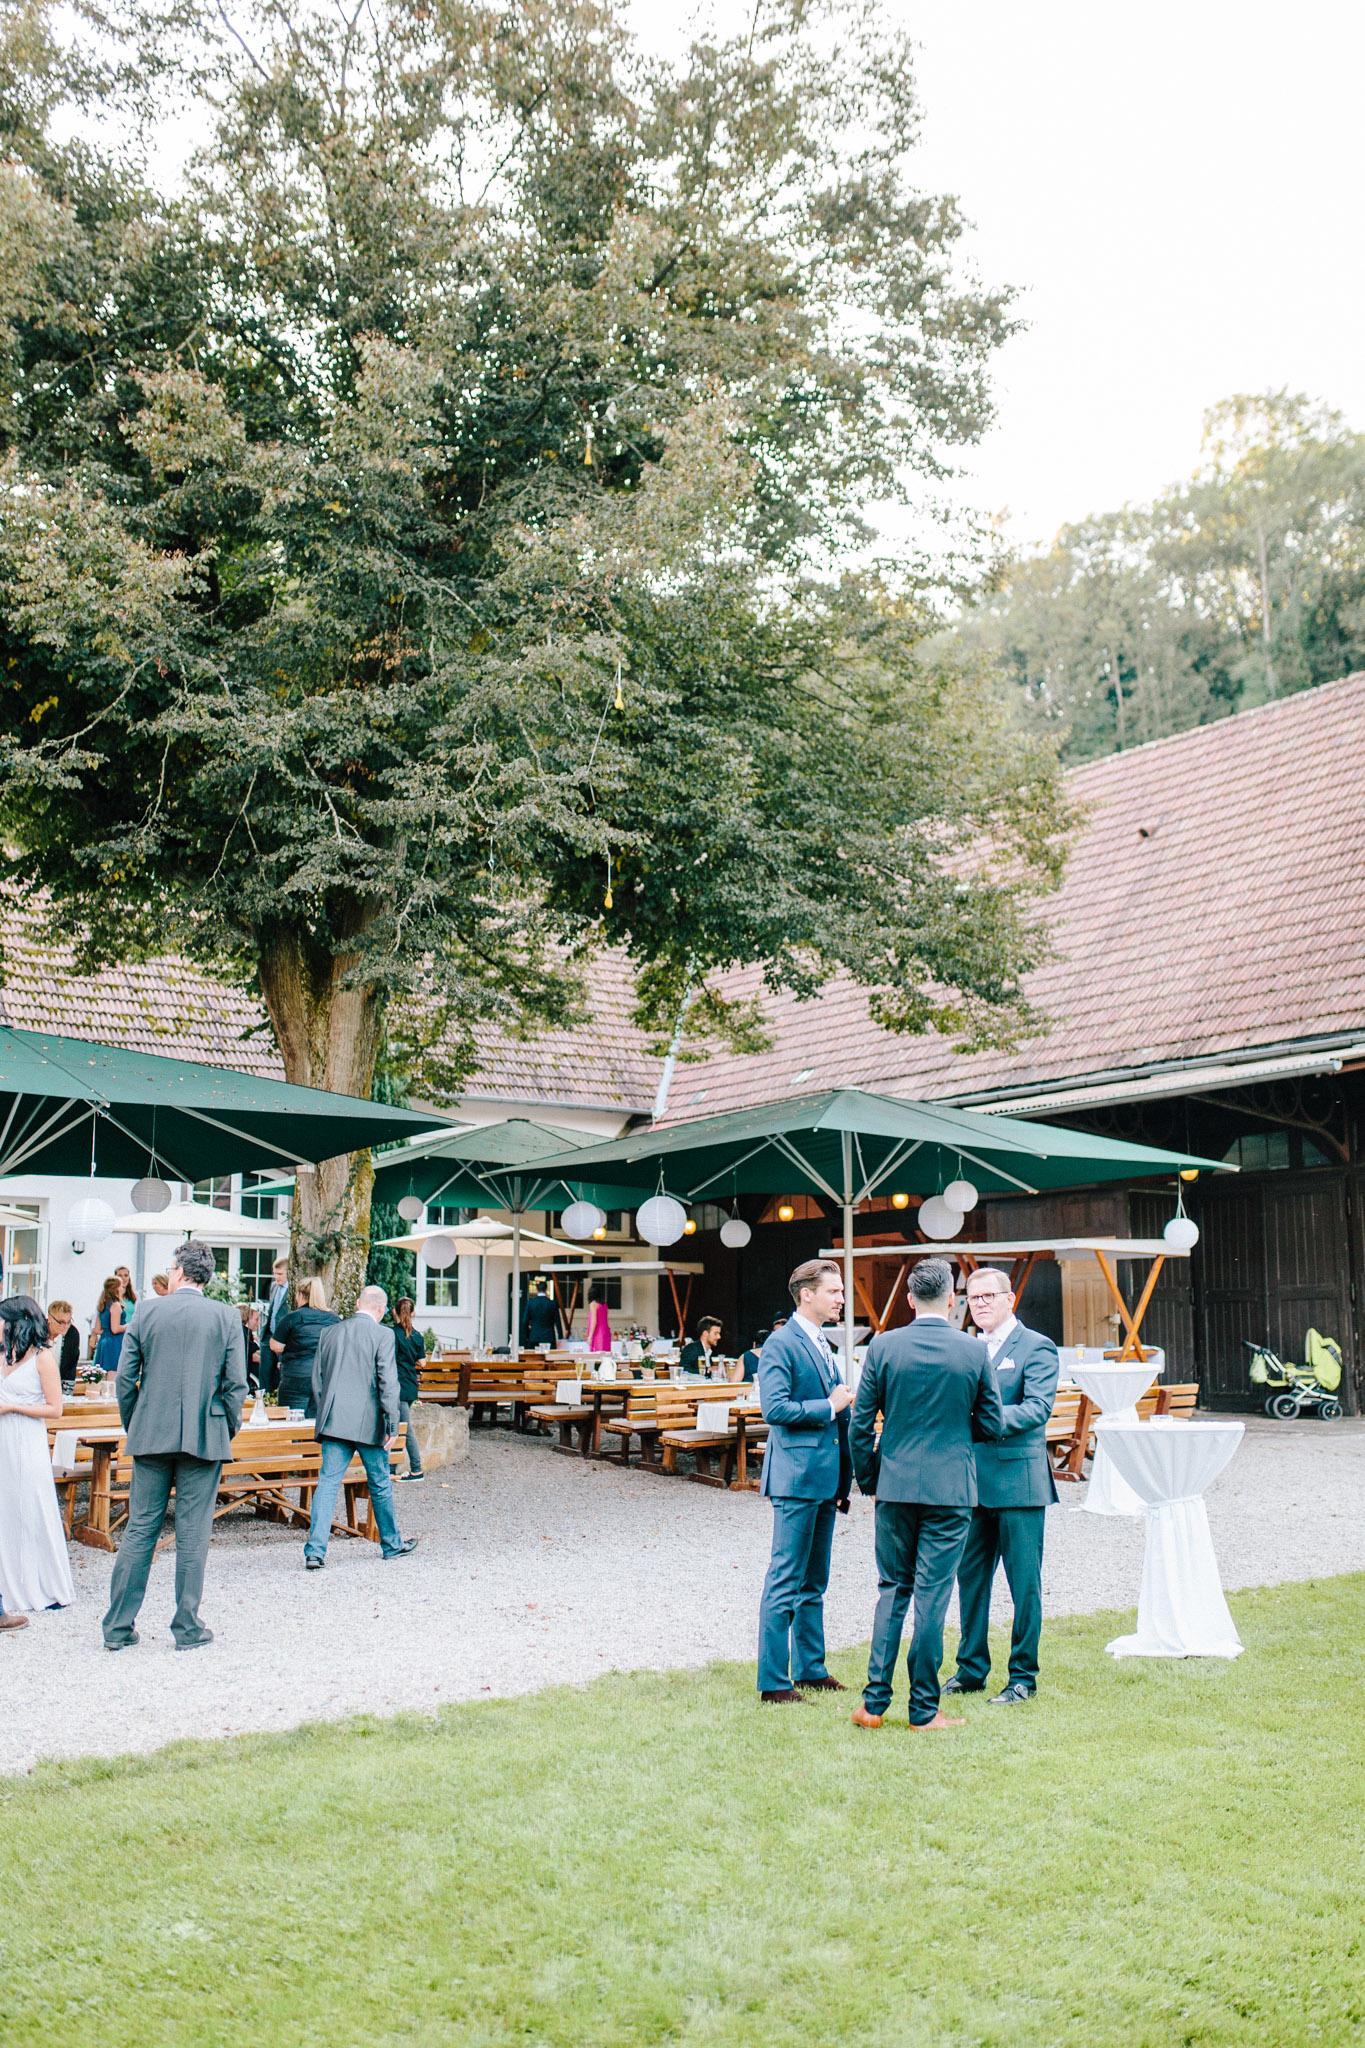 Lilienhof-Freiburg-Hochzeit-Pia-Anna-Christian-Wedding-Photography-FS-84.jpg